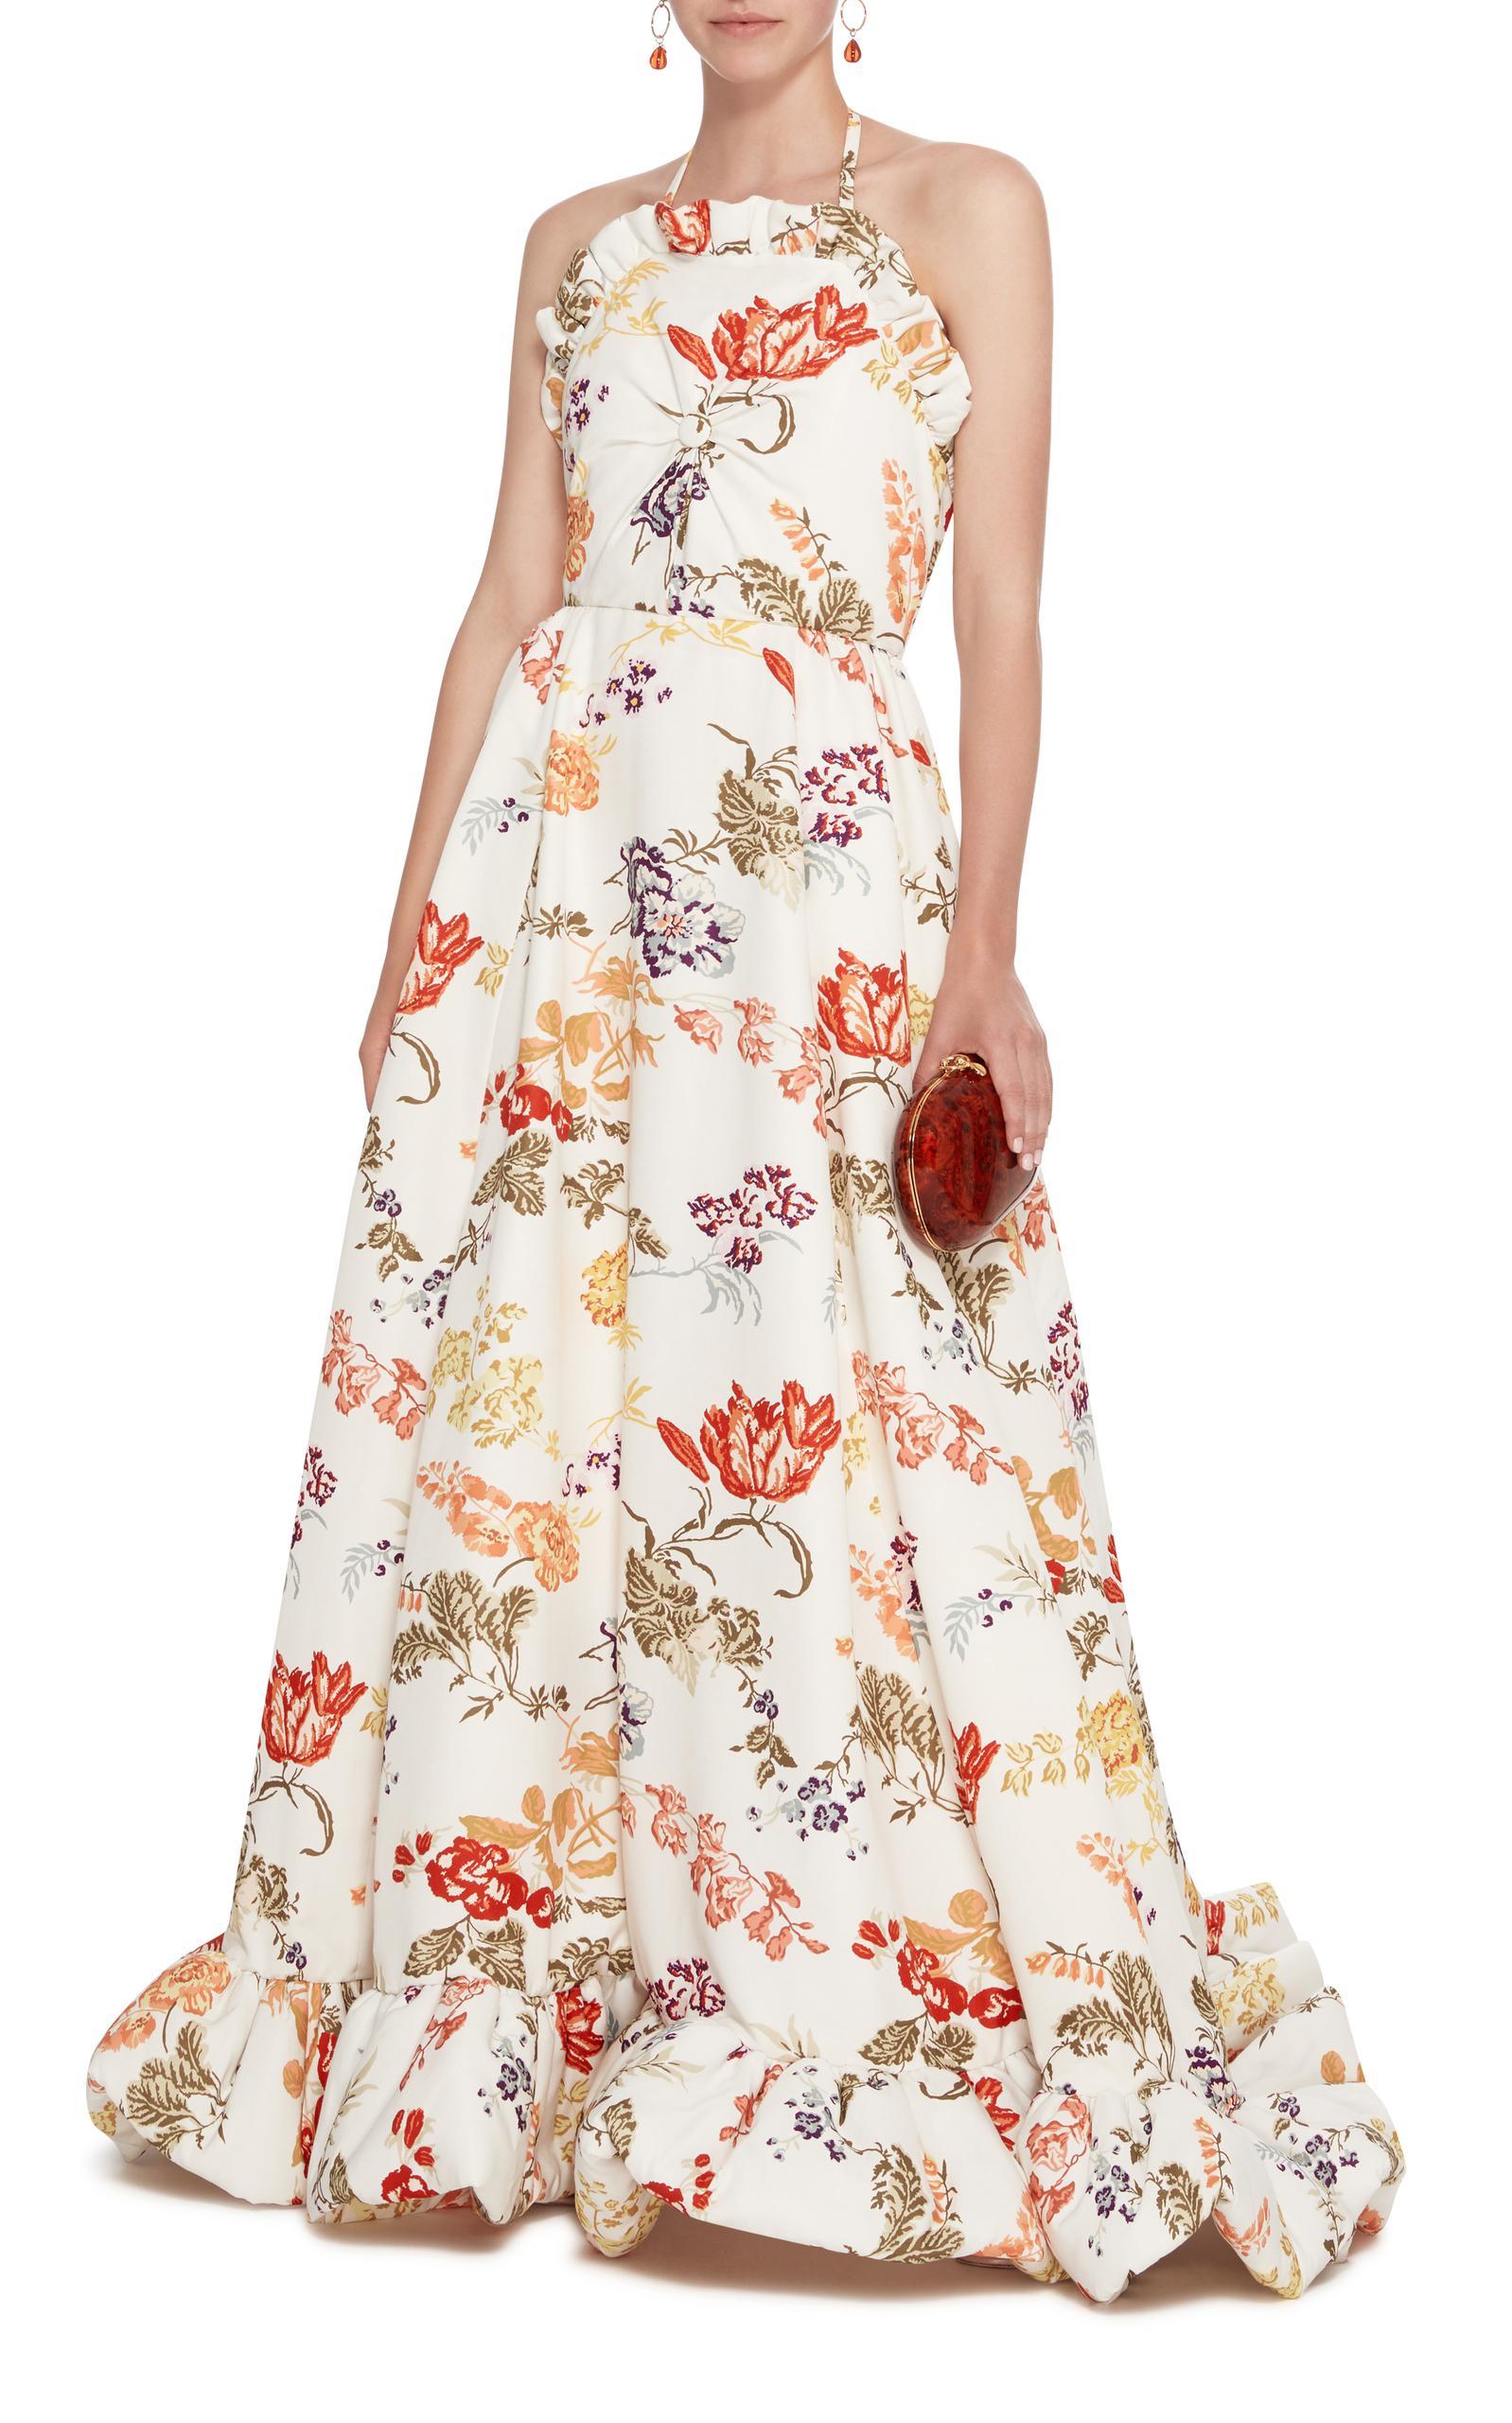 Floral Strapless Empire Waist Gown Rosie Assoulin 4TFn7h6p